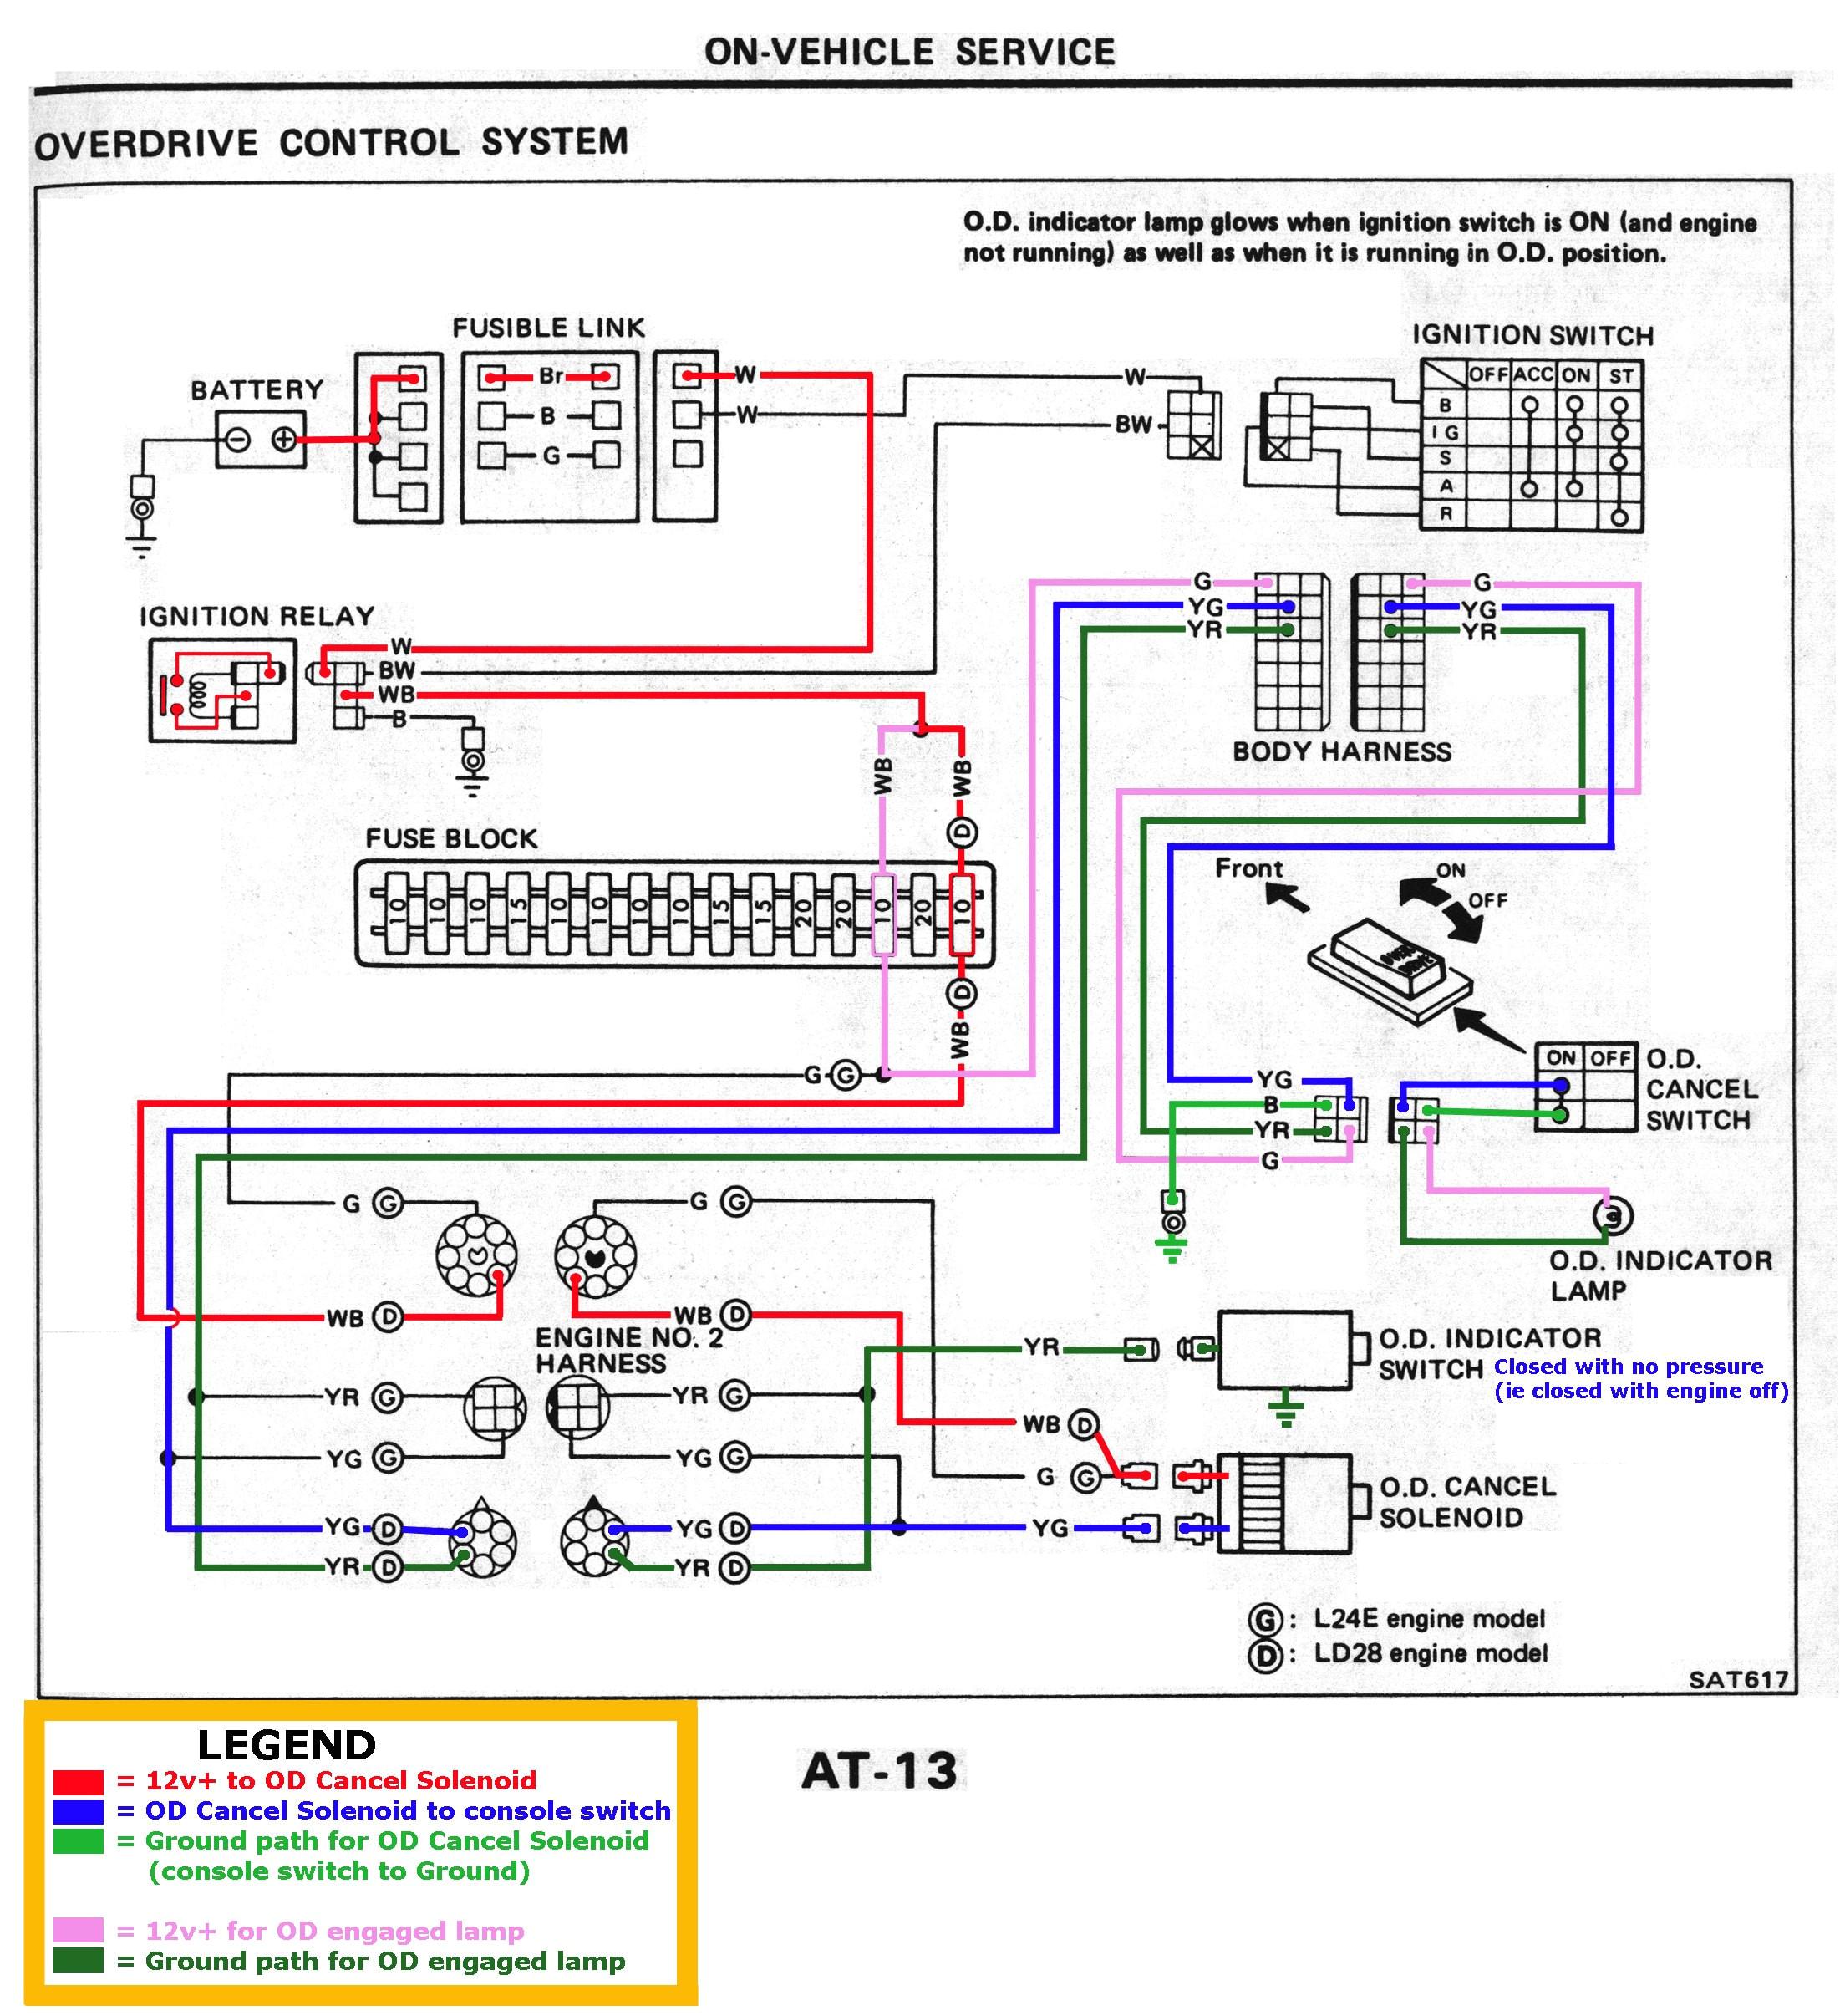 Tvs Apache Wiring Diagram Nissan Truck 19951997 Wiring Kit Harness Curt Mfg 55353 Blog